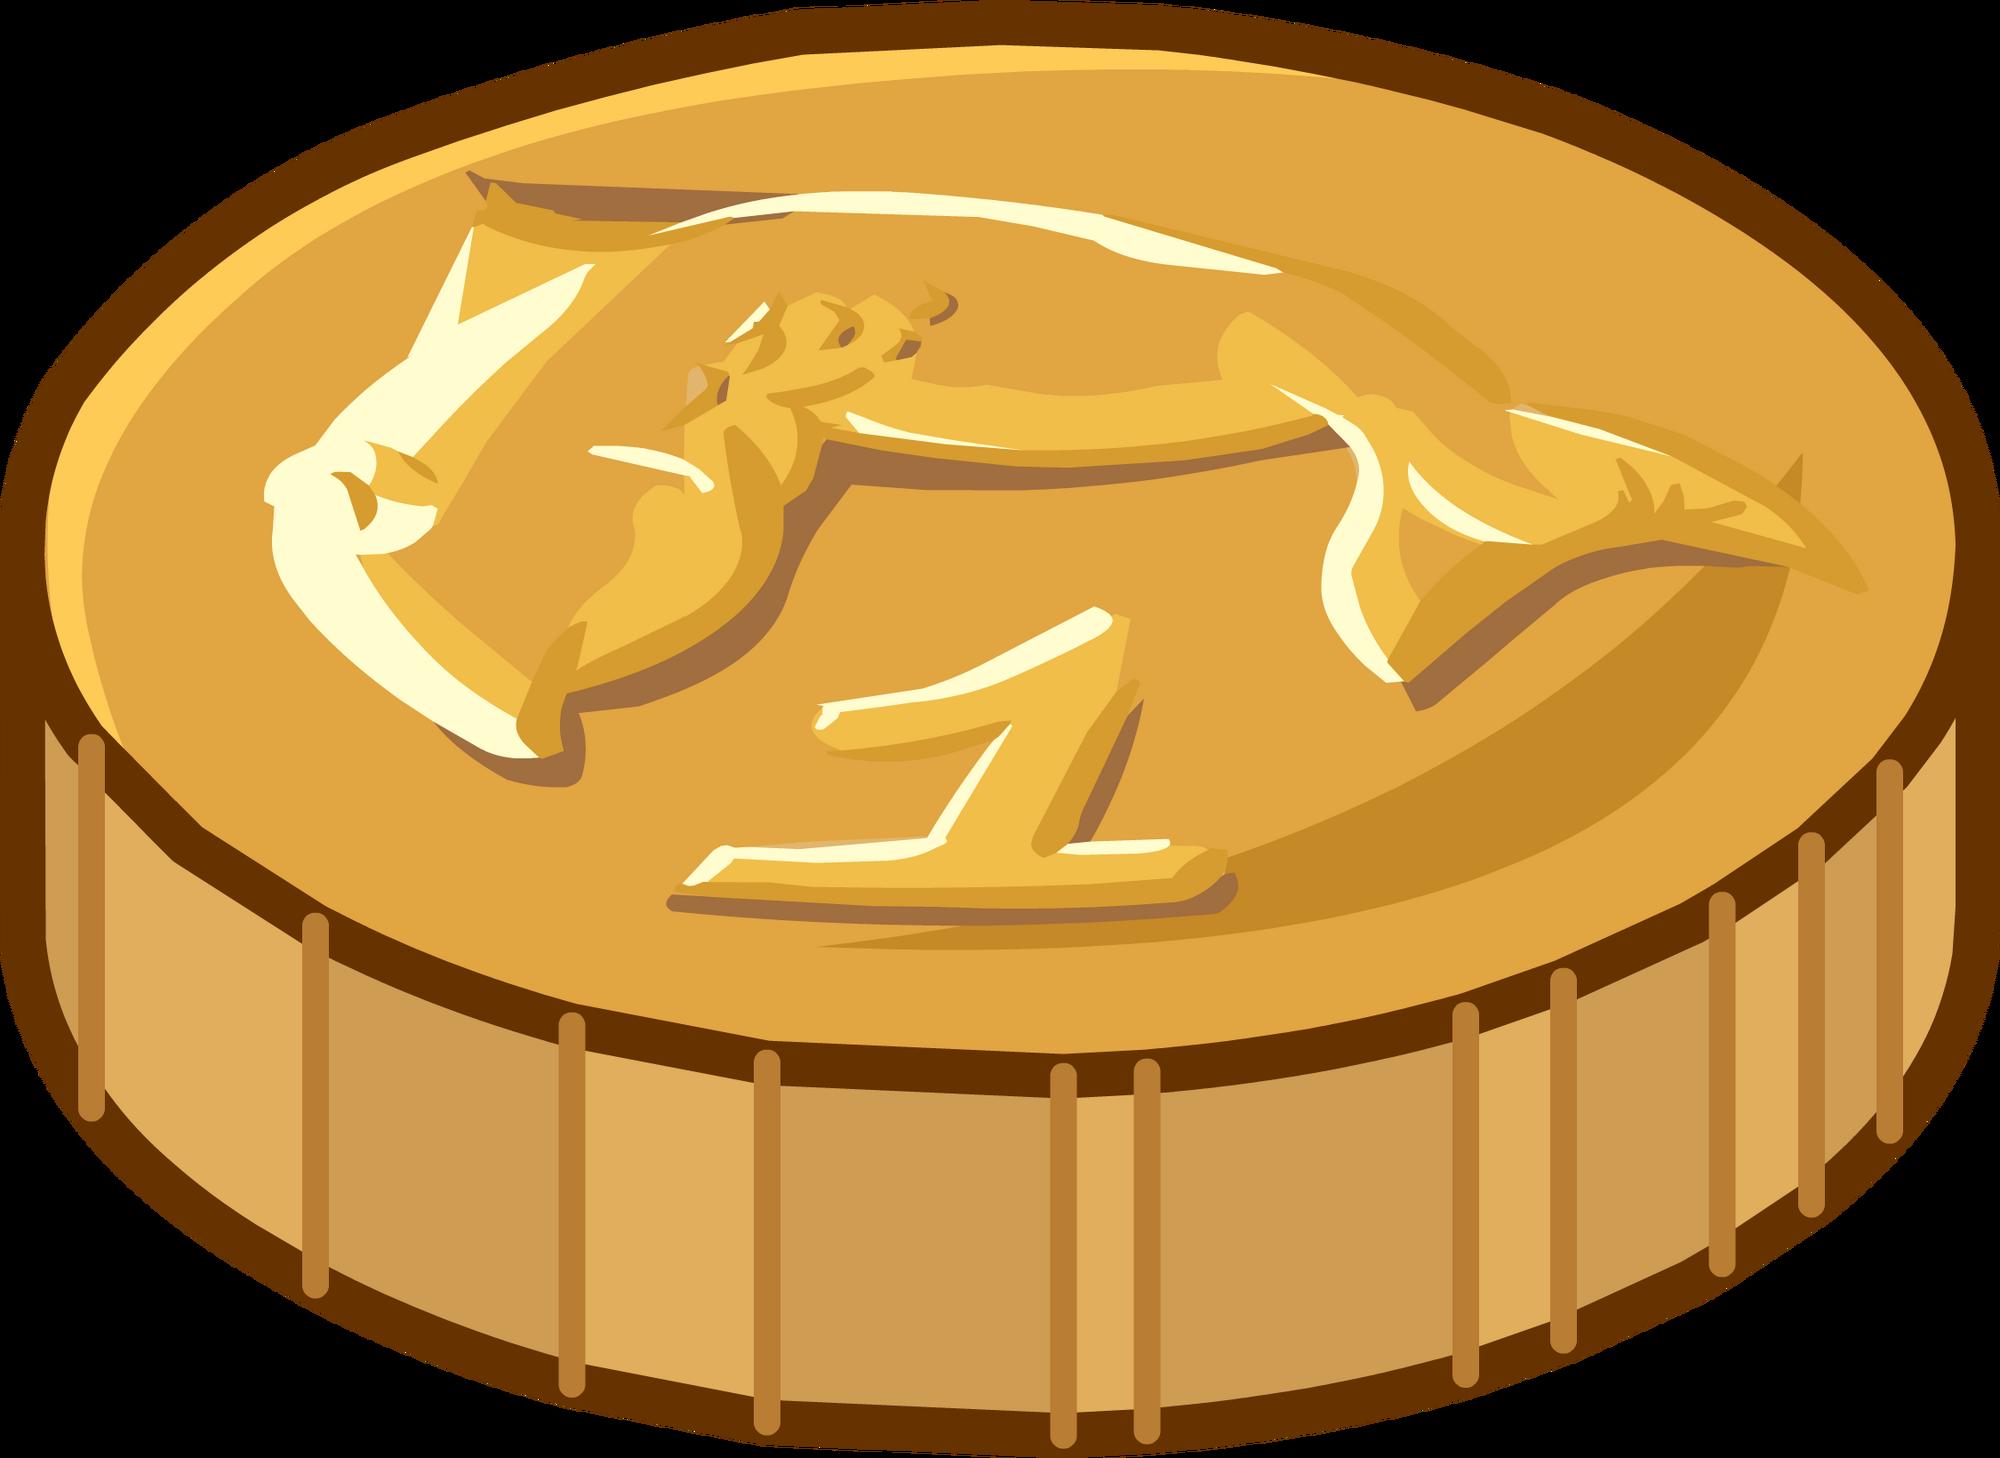 Coins | Club Penguin Rewritten Wiki | FANDOM powered by Wikia